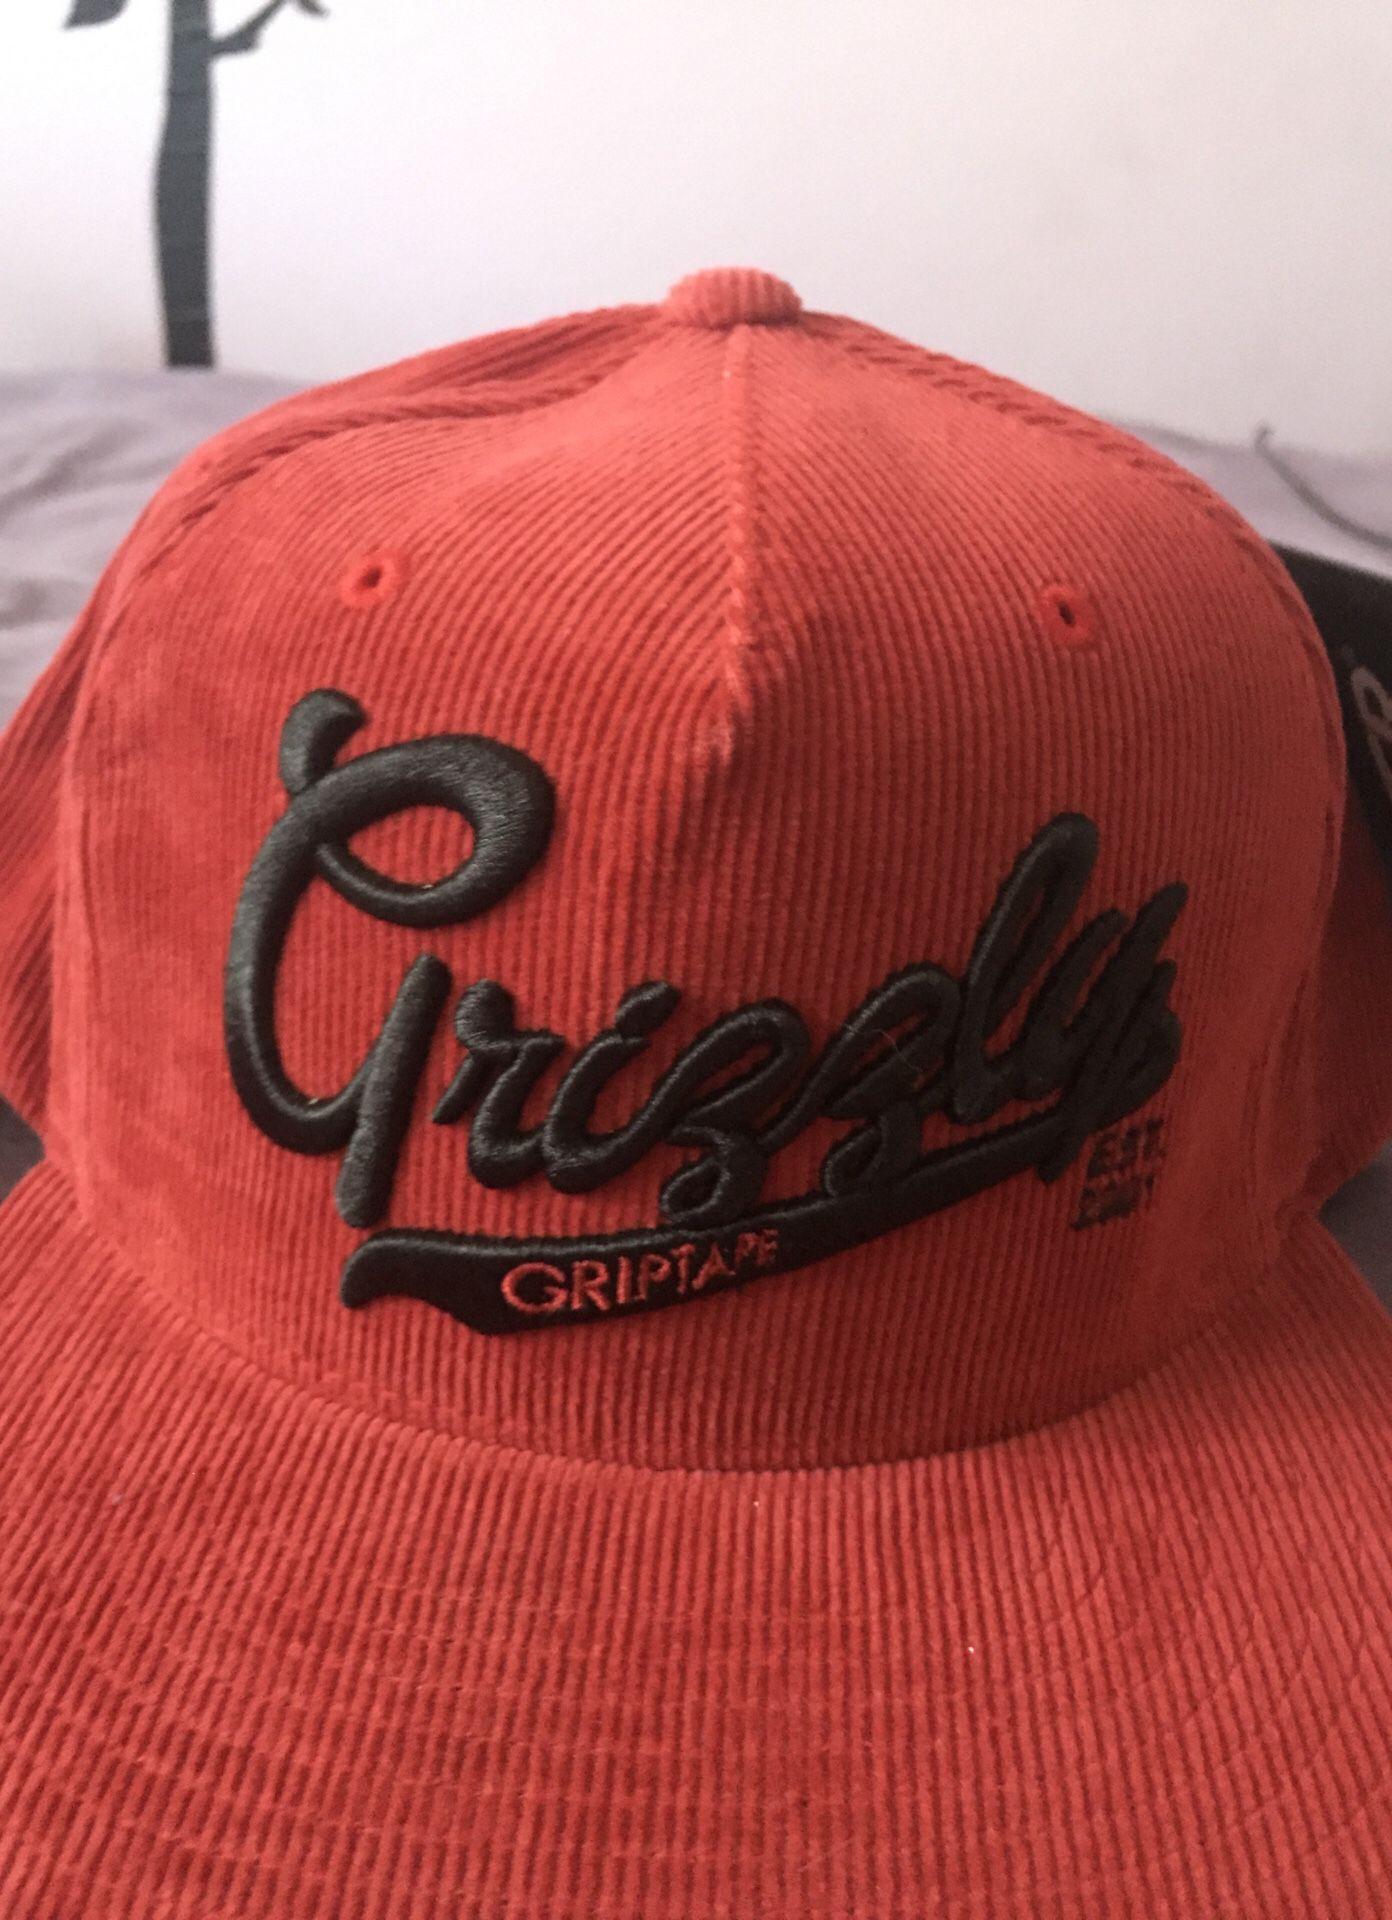 $10 Diamond grizzly grip tape snapback hat